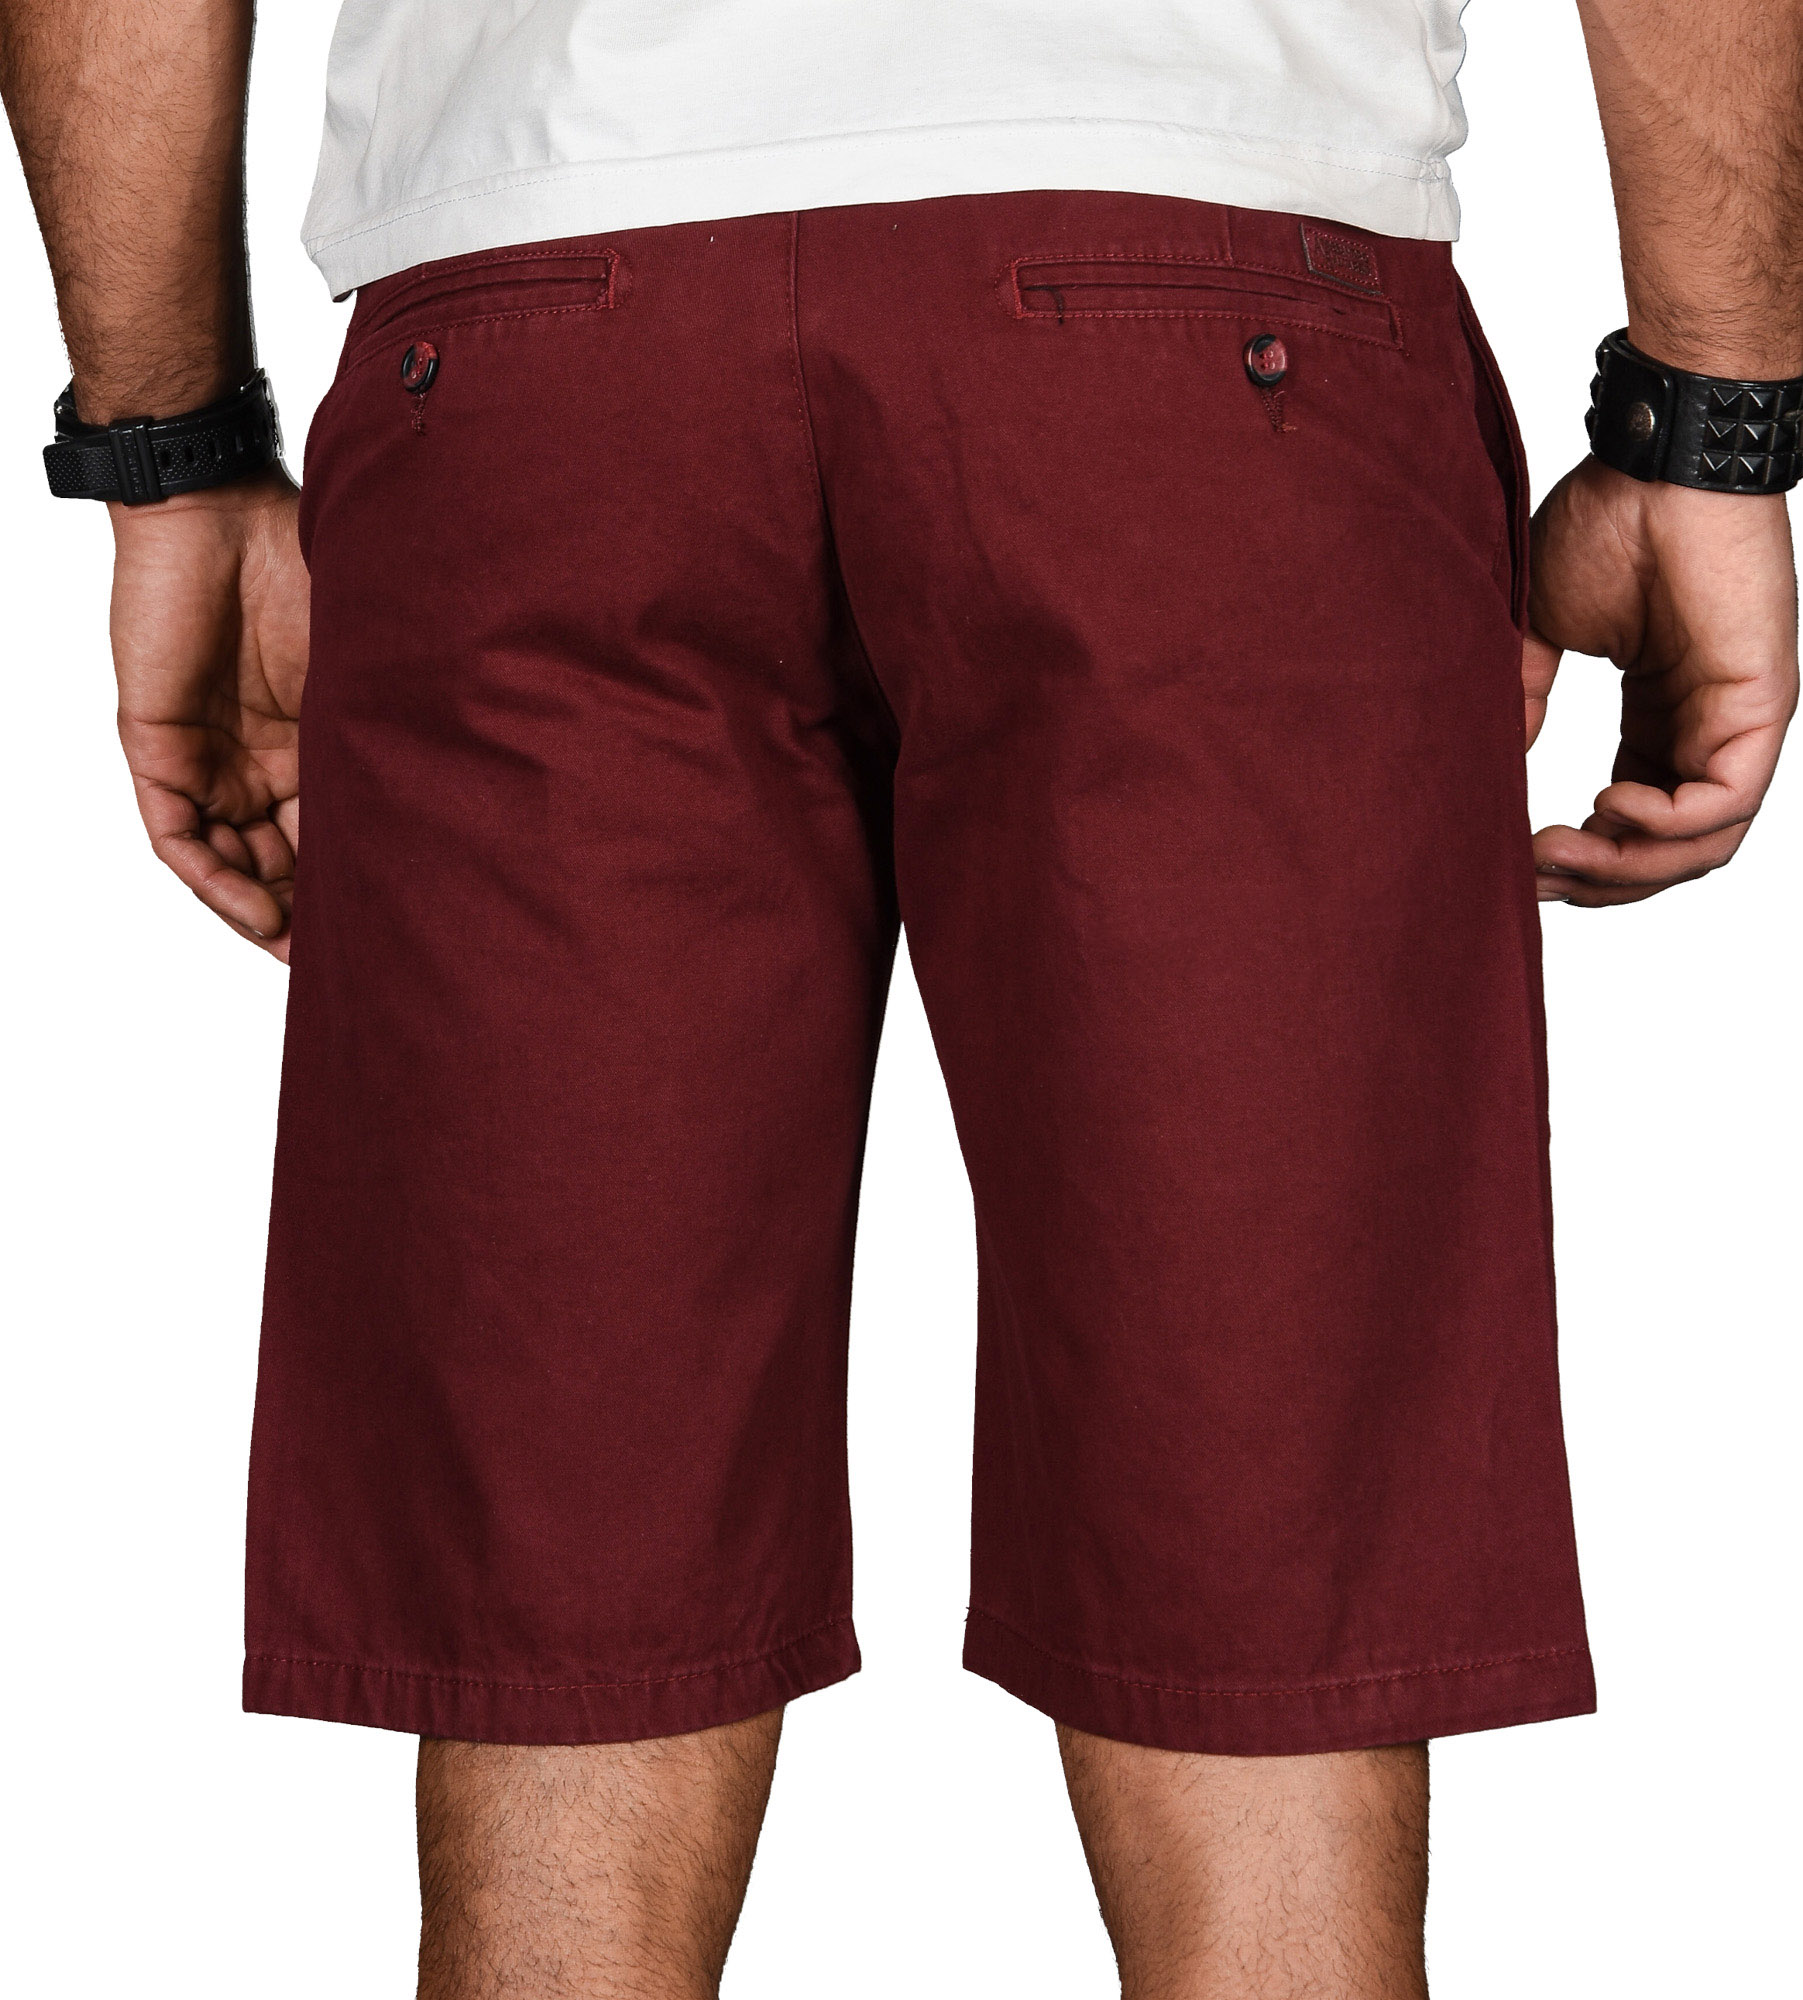 A-Salvarini-Herren-Shorts-kurze-Sommer-Hose-mit-Guertel-Short-Bermuda-NEU-AS096 Indexbild 35